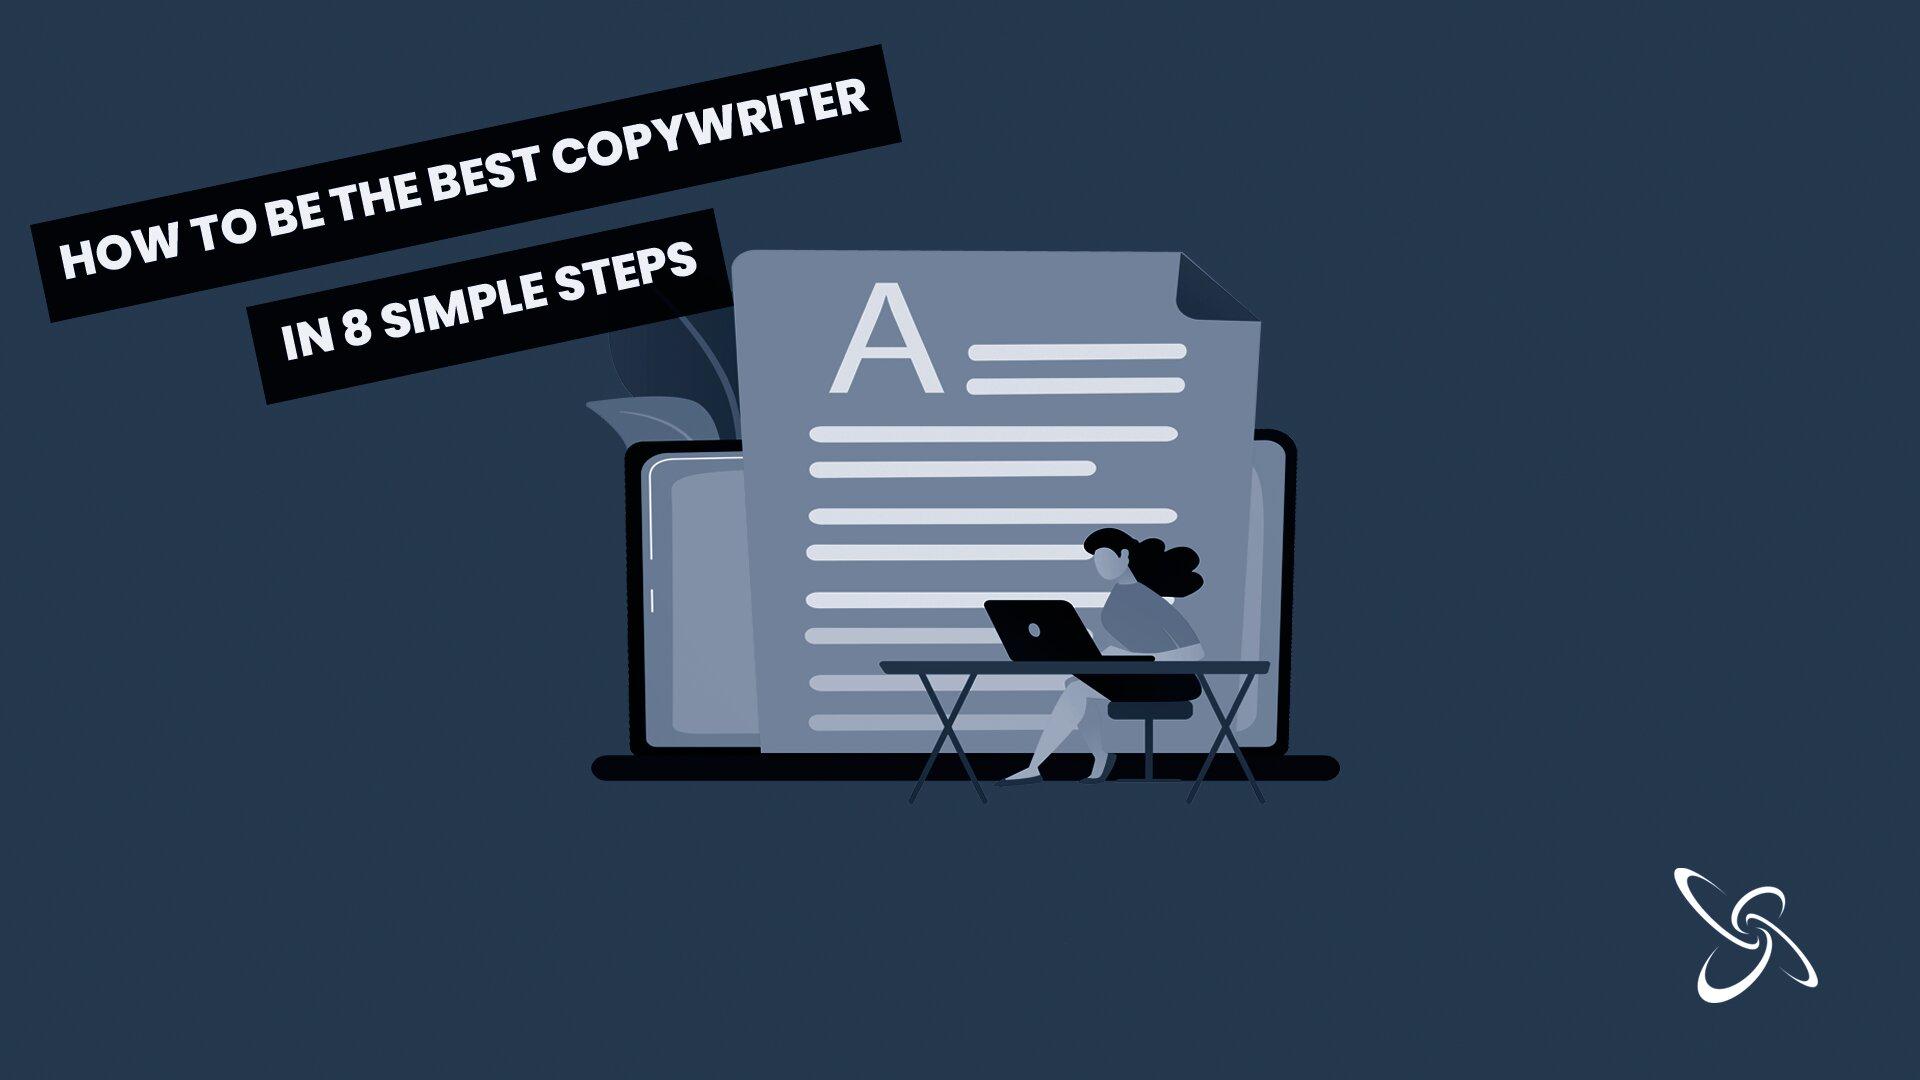 how to be a copywriter